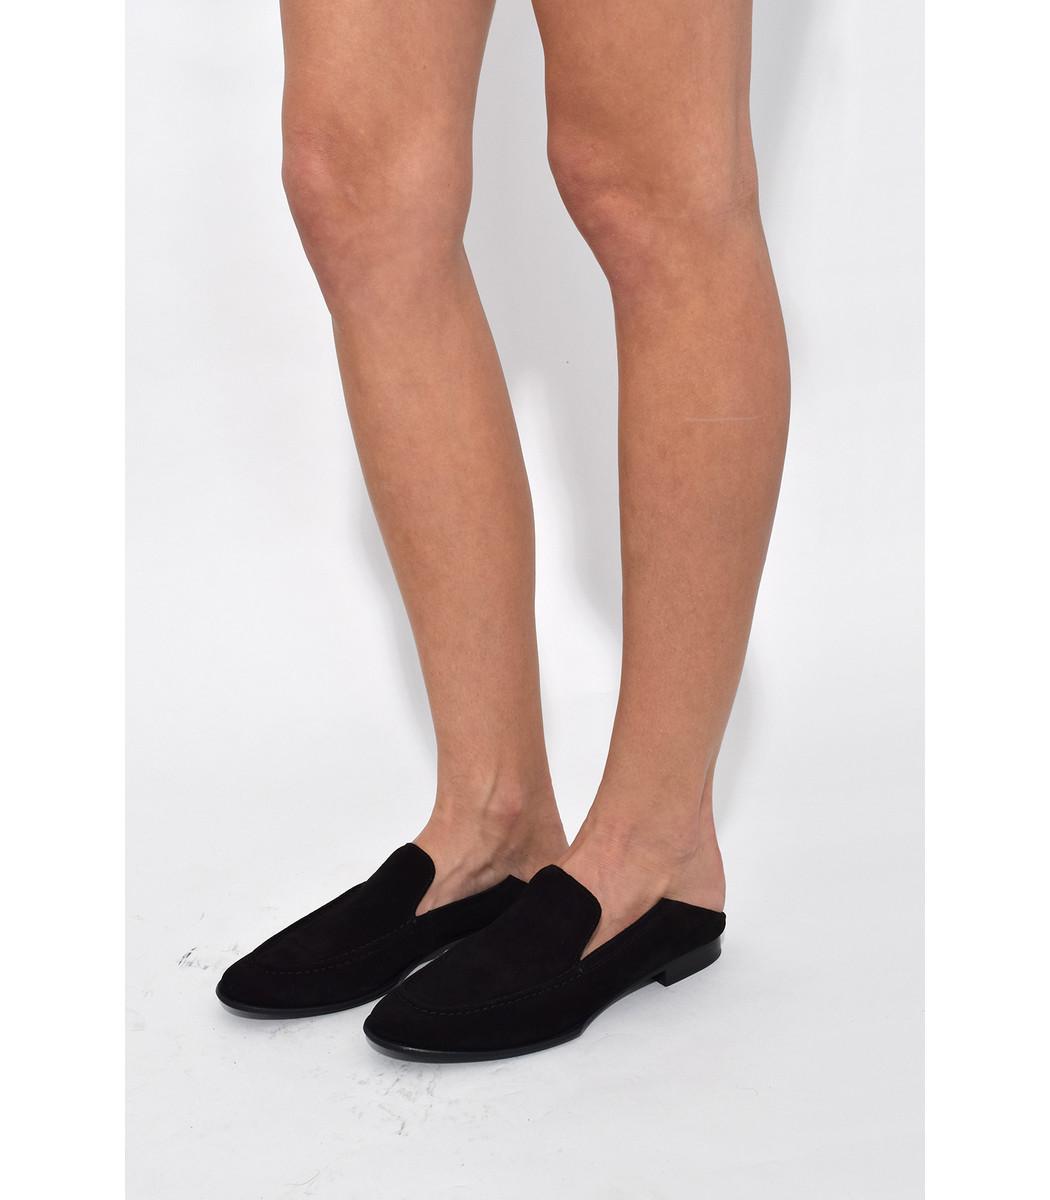 Rag & Bone Black Suede Convertible Alix Loafers U7vkvjtU